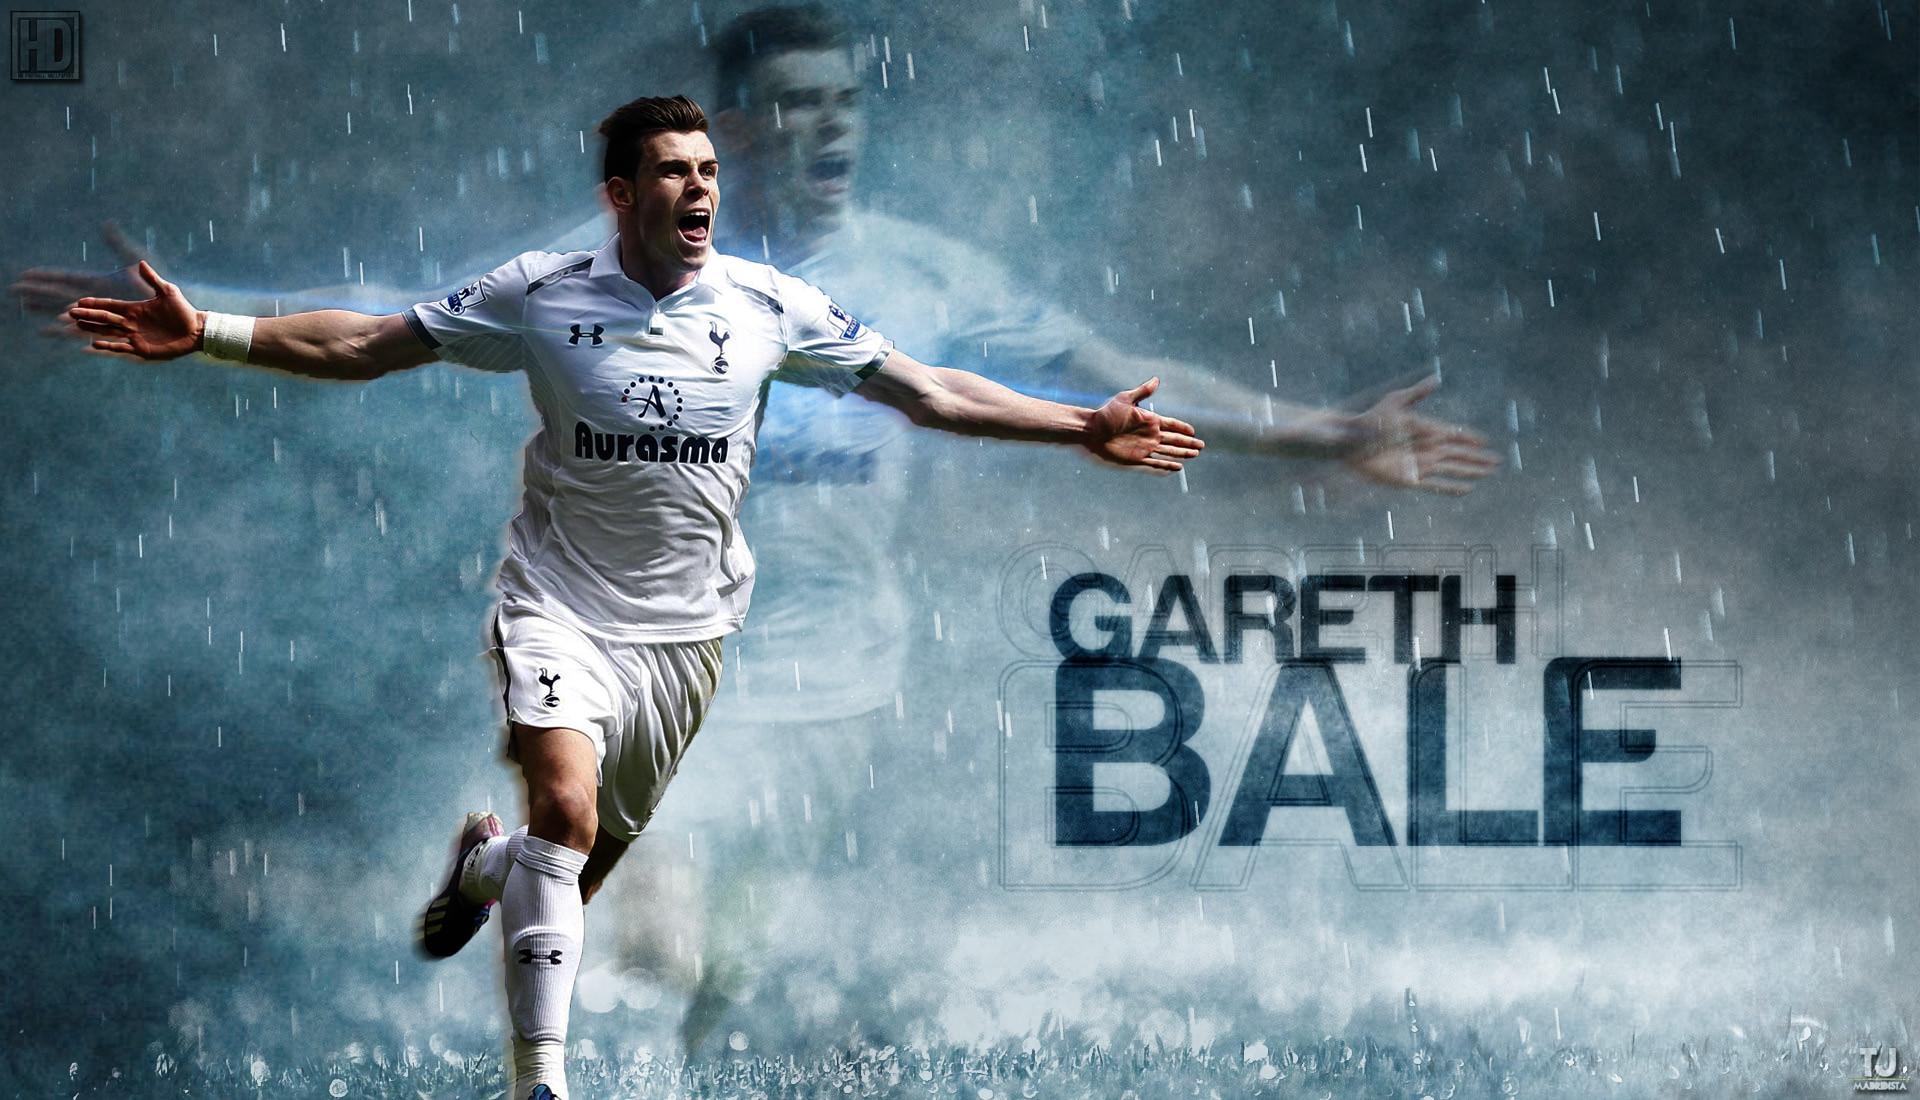 Gareth Bale Tottenham Hotspurs Wallpaper 2014 HD